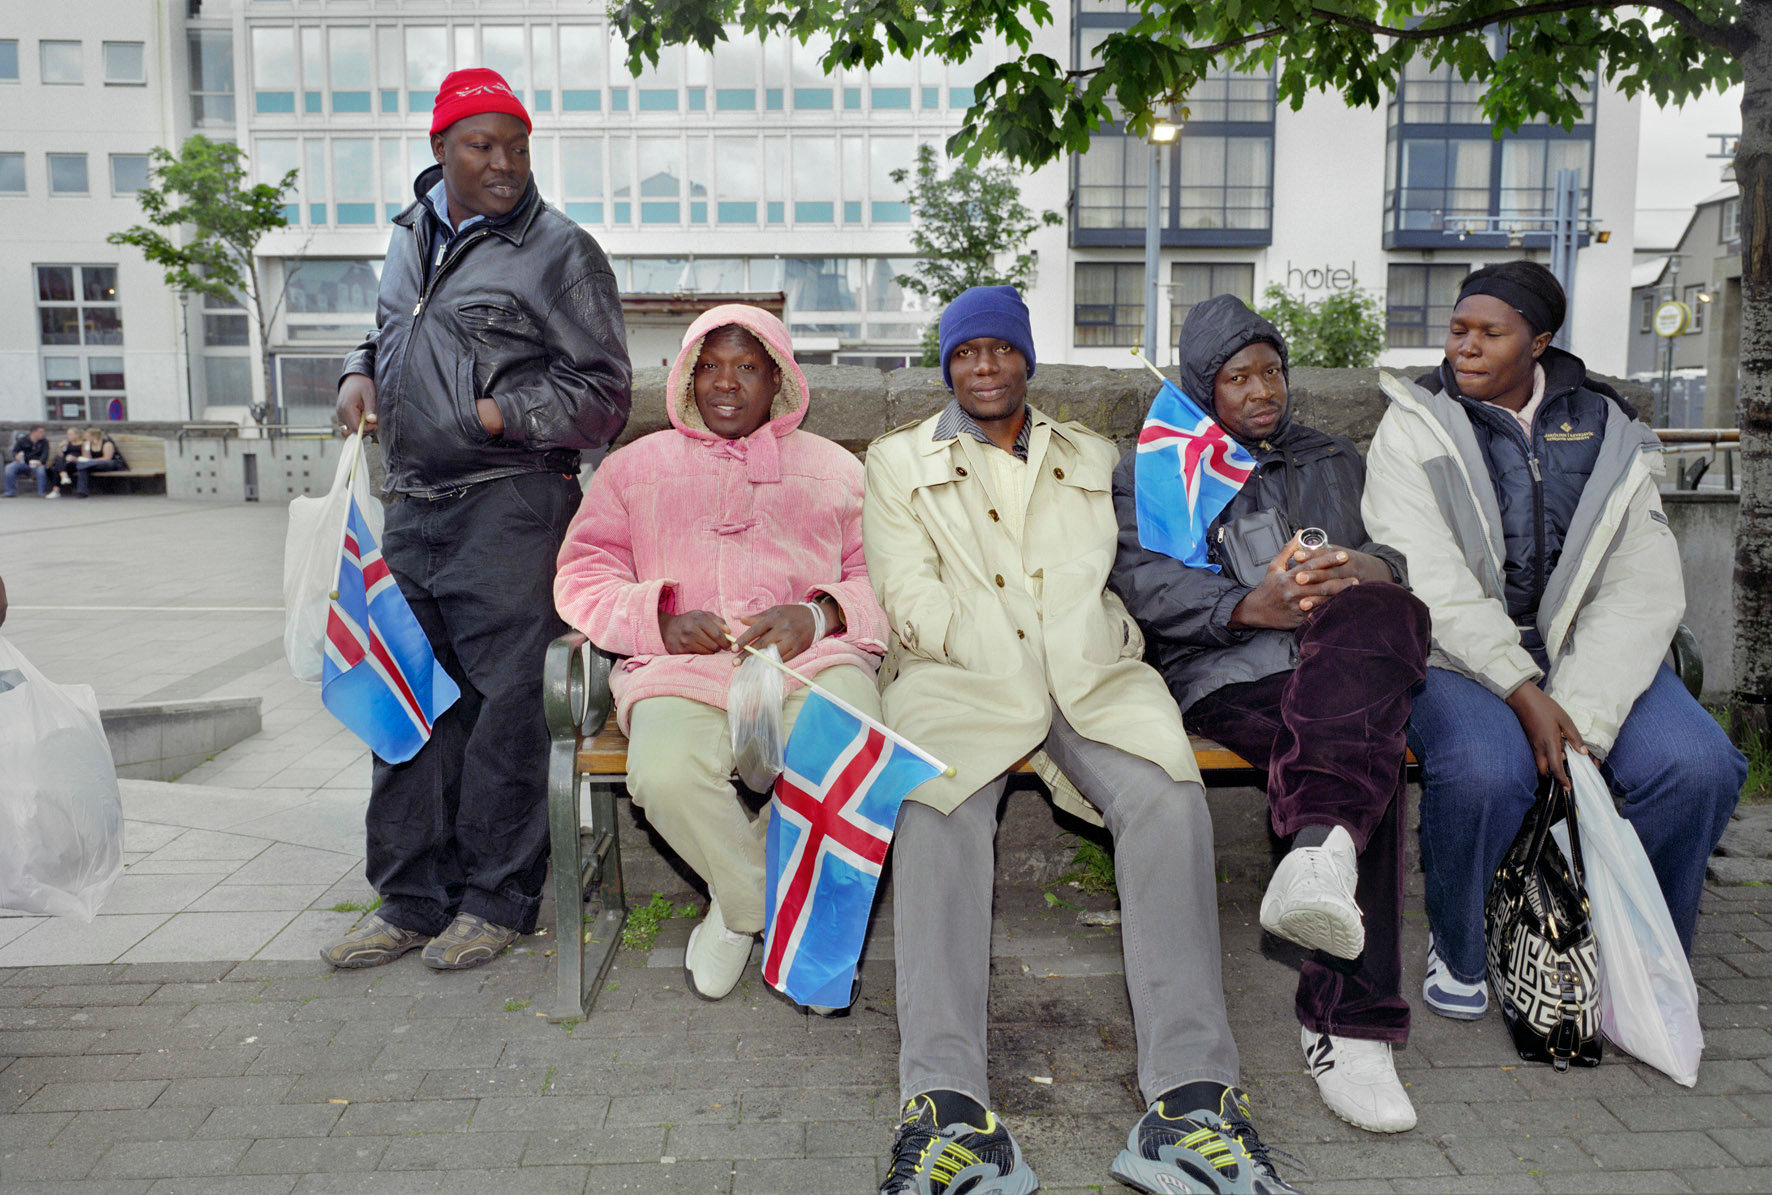 EU 778 5 Reykjavik, Afrikaanse studenten 1 kopie.jpg